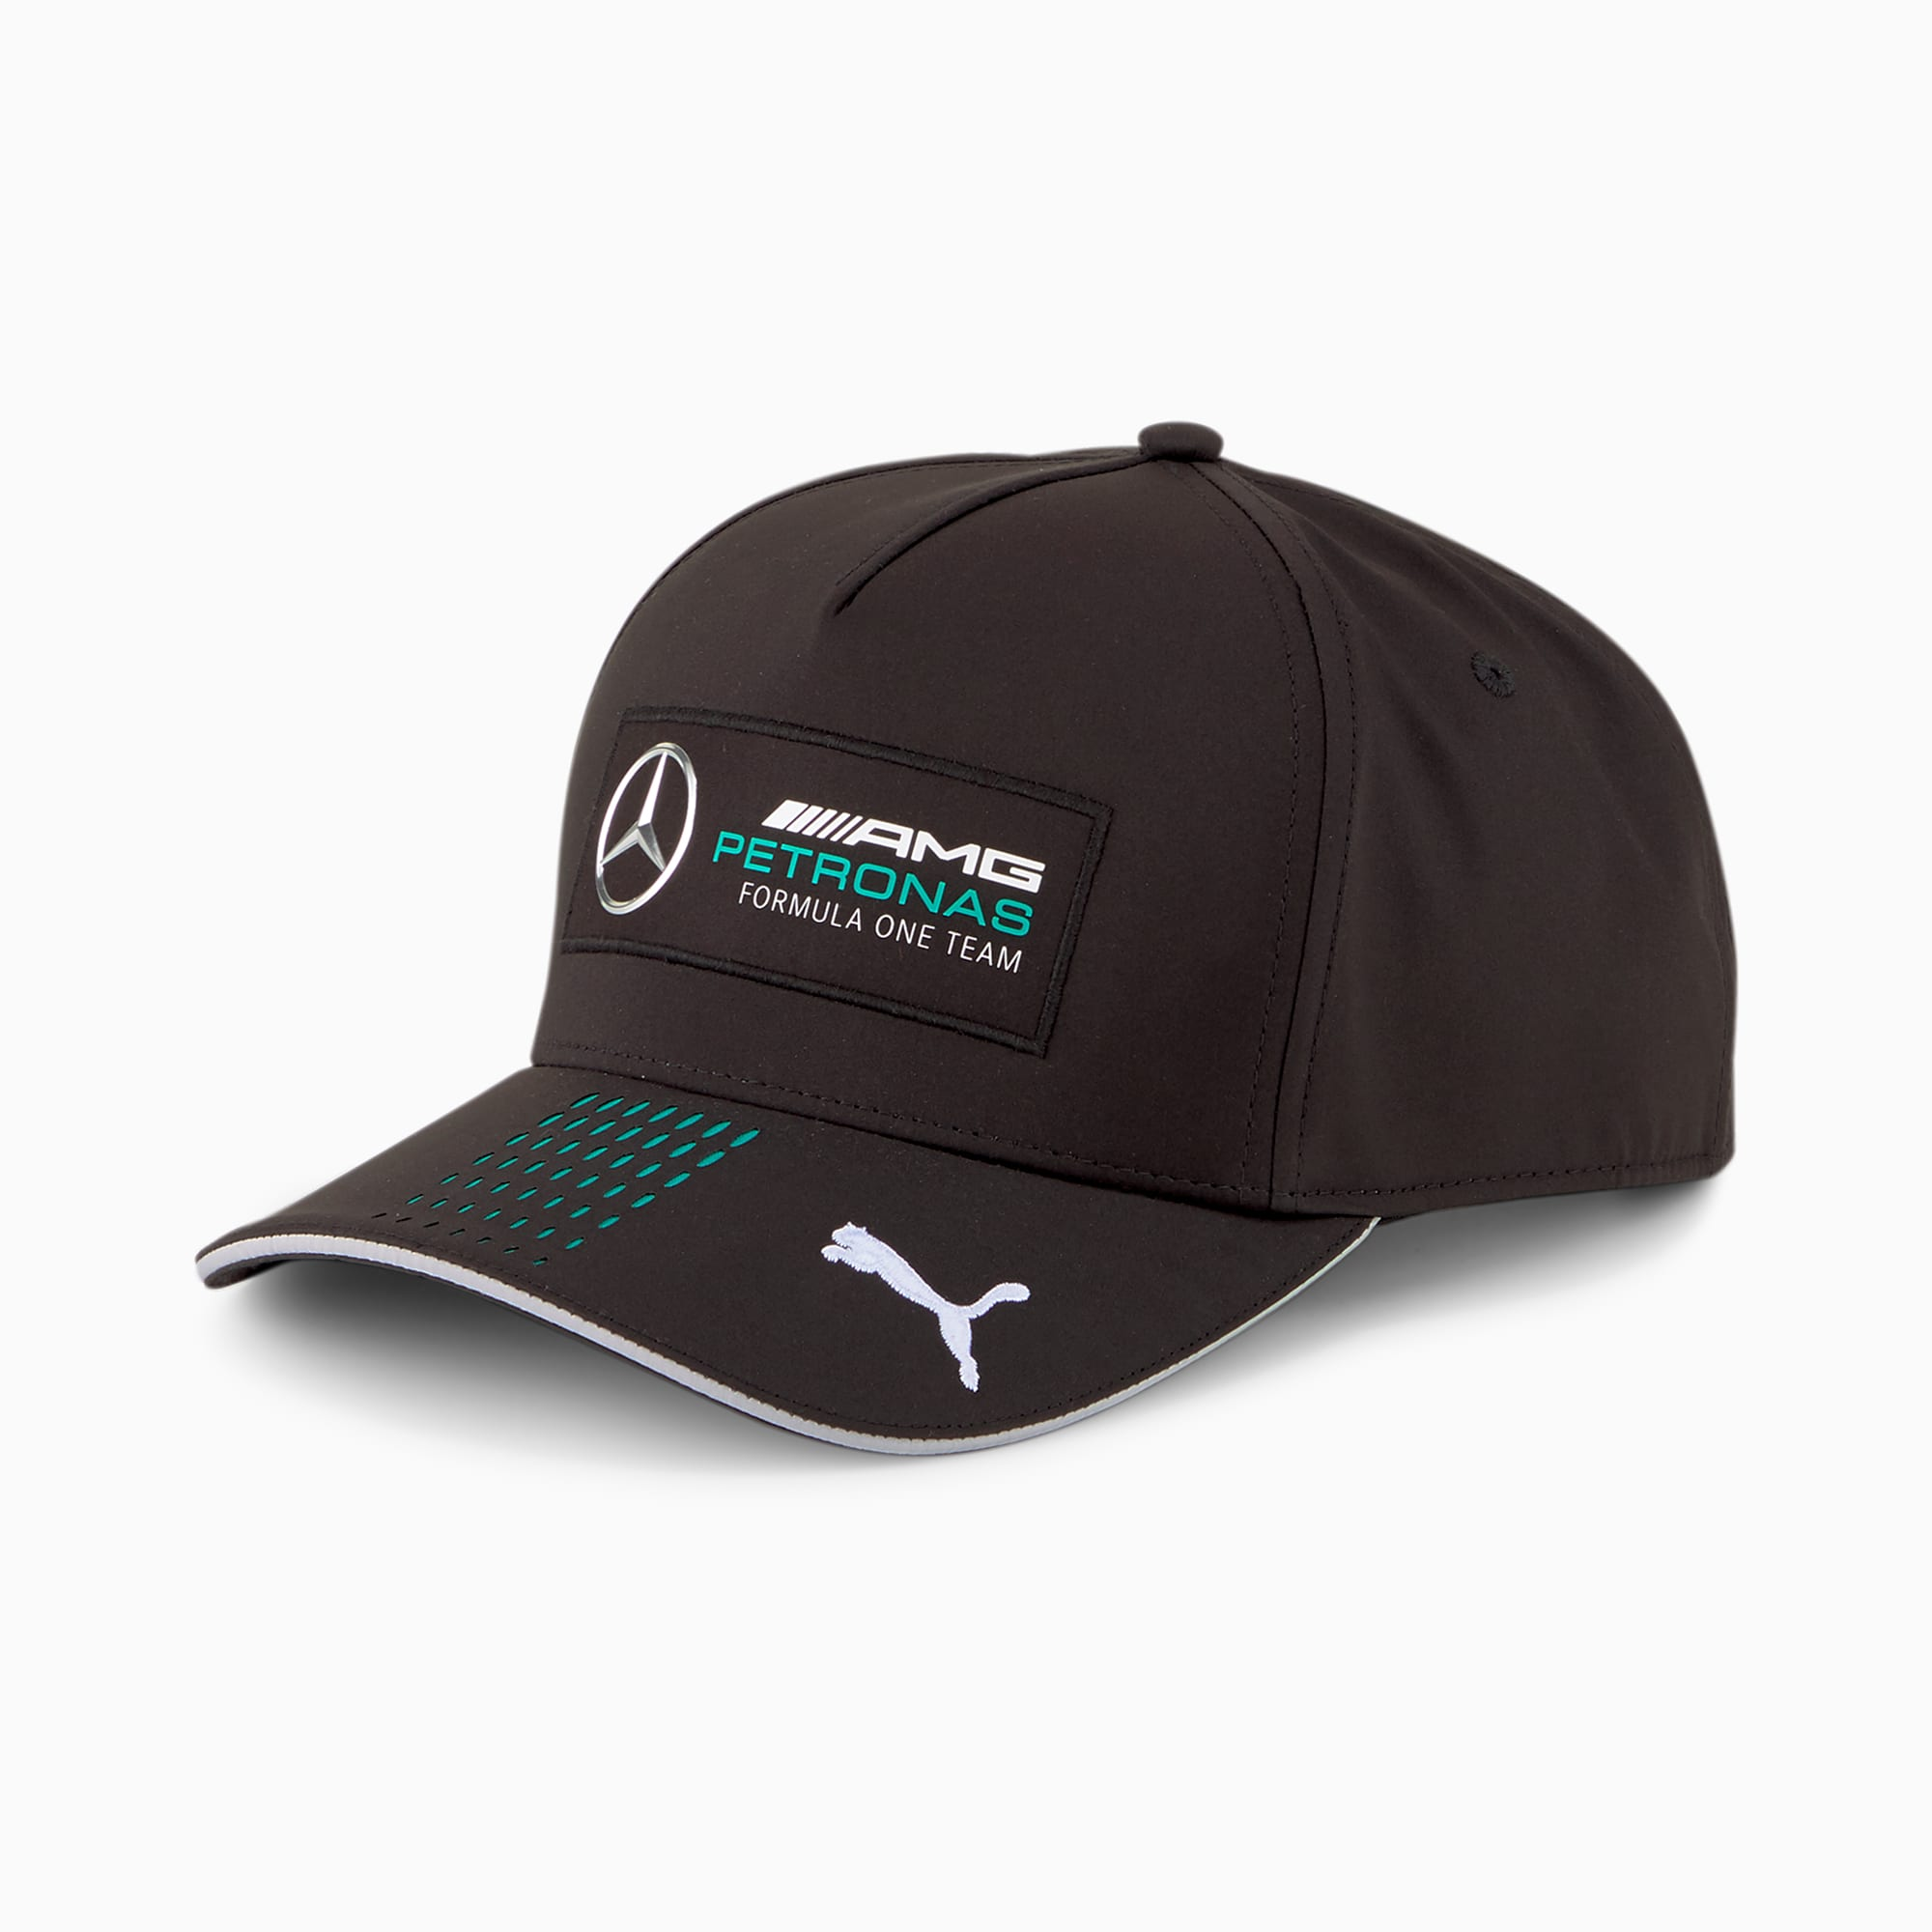 Casquette de baseball Mercedes F1, Noir, Accessoires - PUMA - Modalova